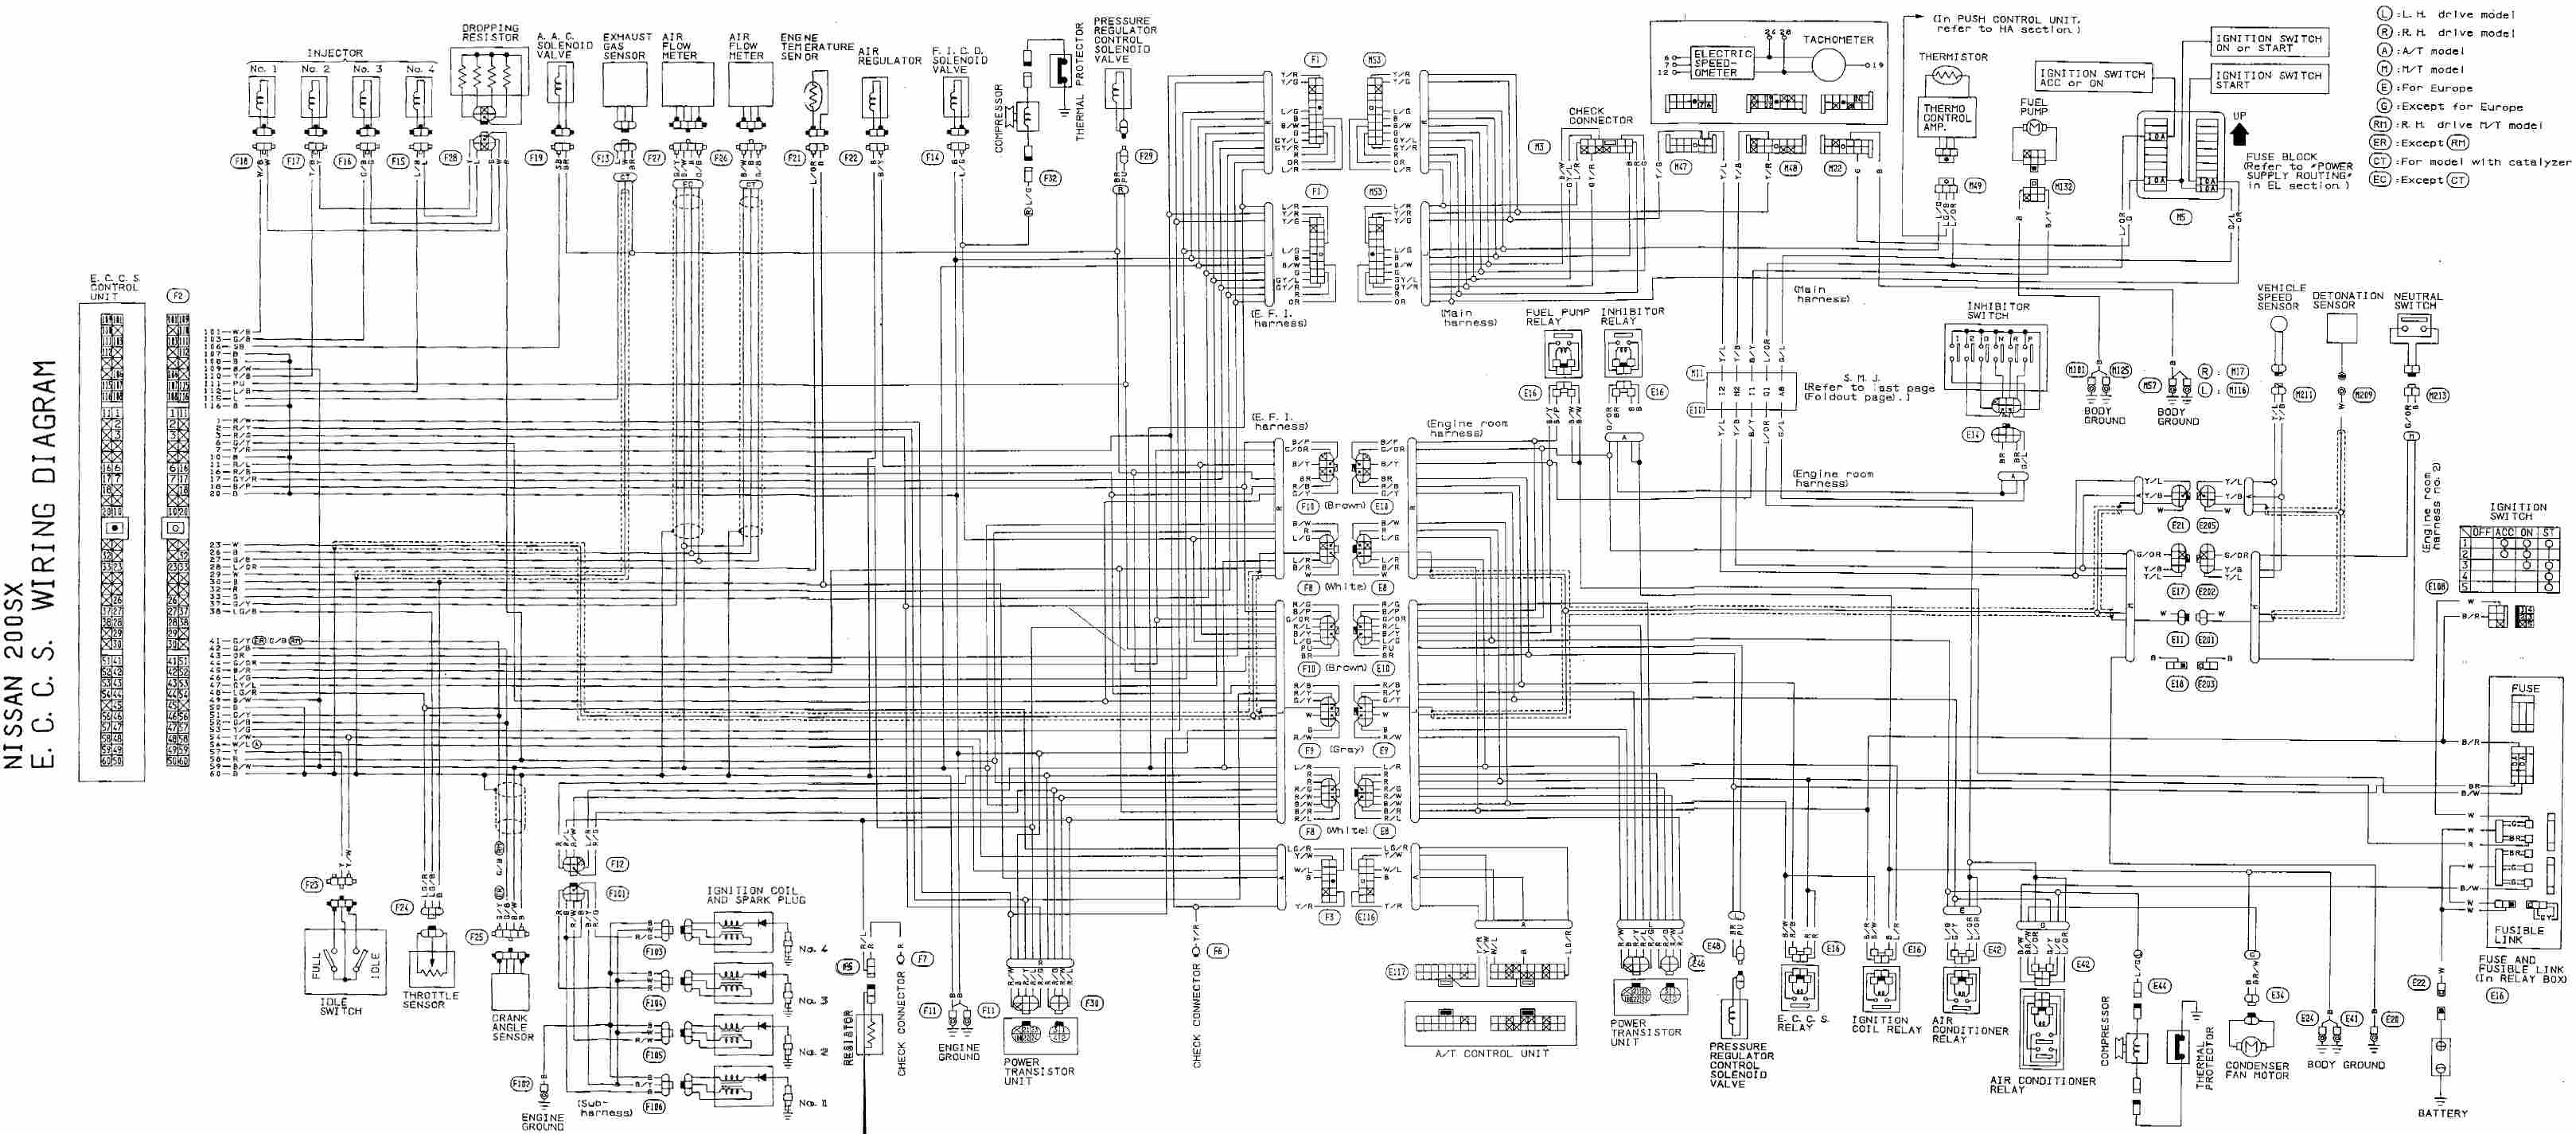 1996 nissan 200sx radio wiring diagram 1996 subaru svx